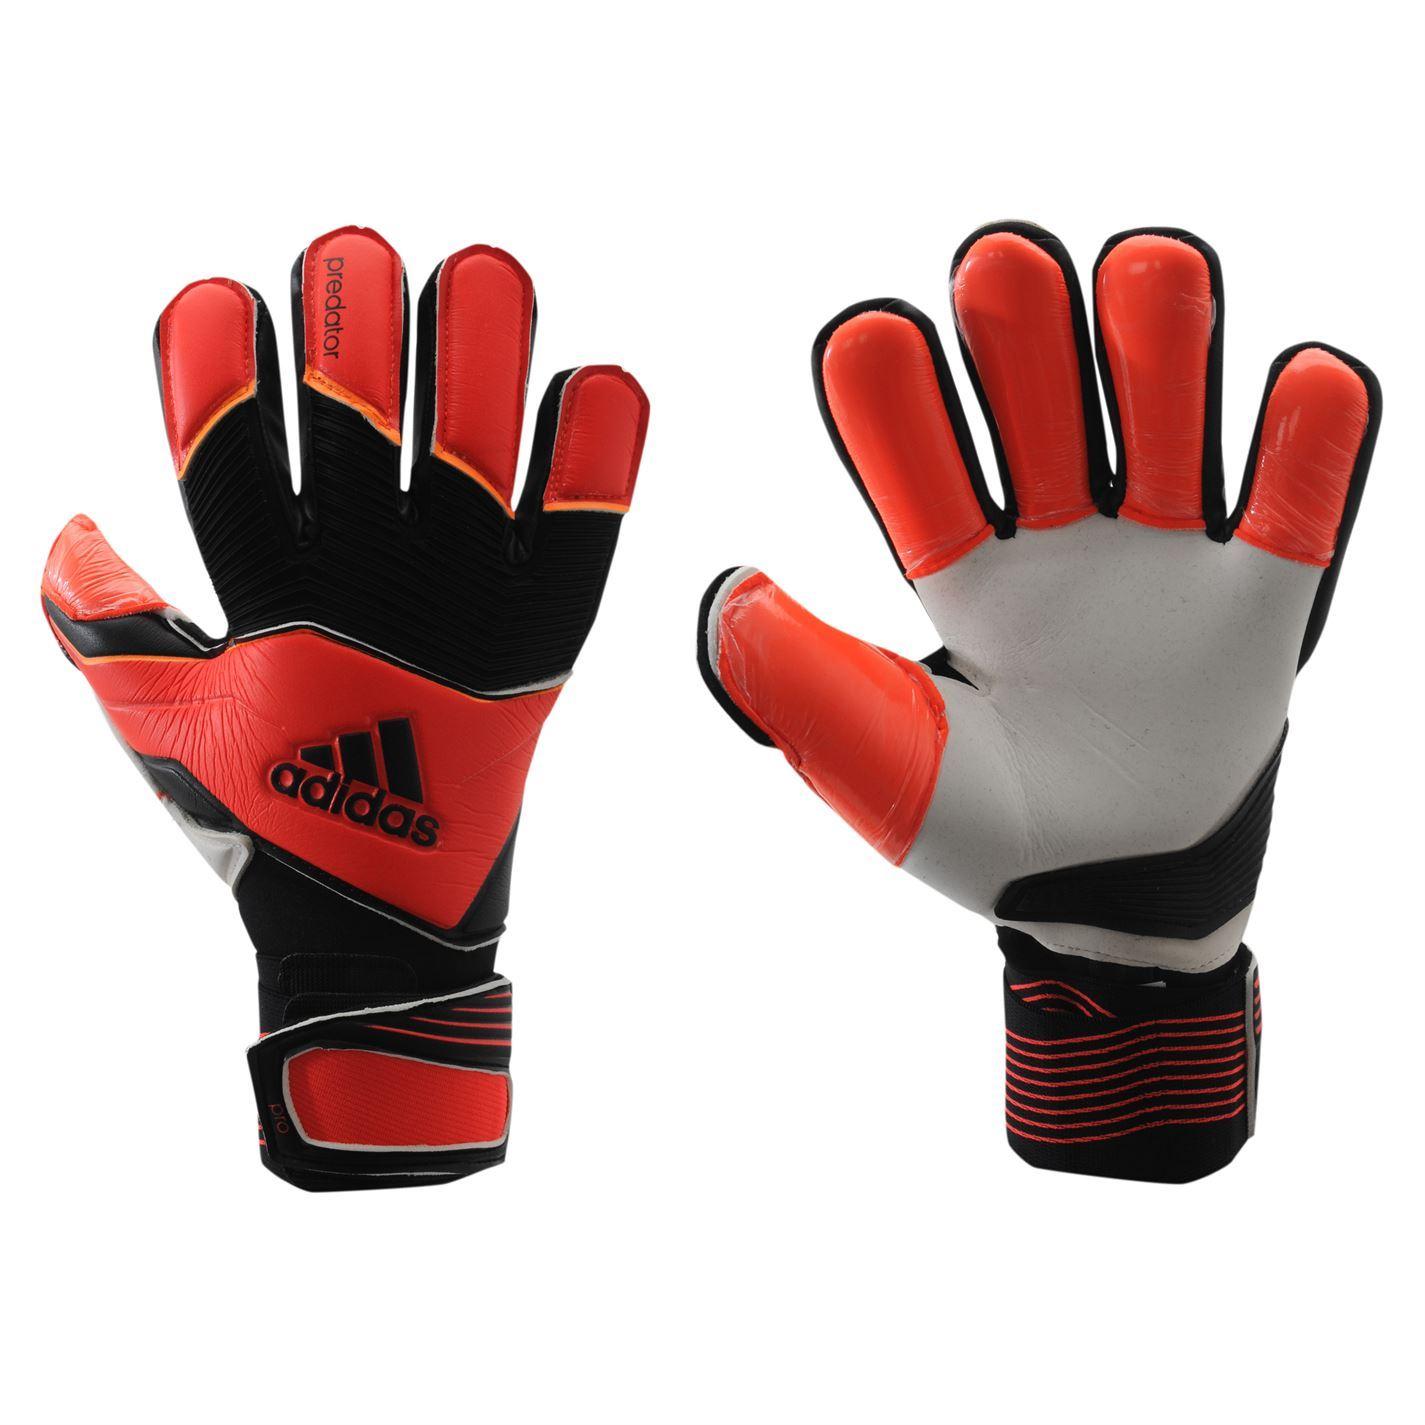 adidas Predator Pro FS Goalkeeper Gloves - Black/Red ... |Goalkeeper Gloves Adidas 2015